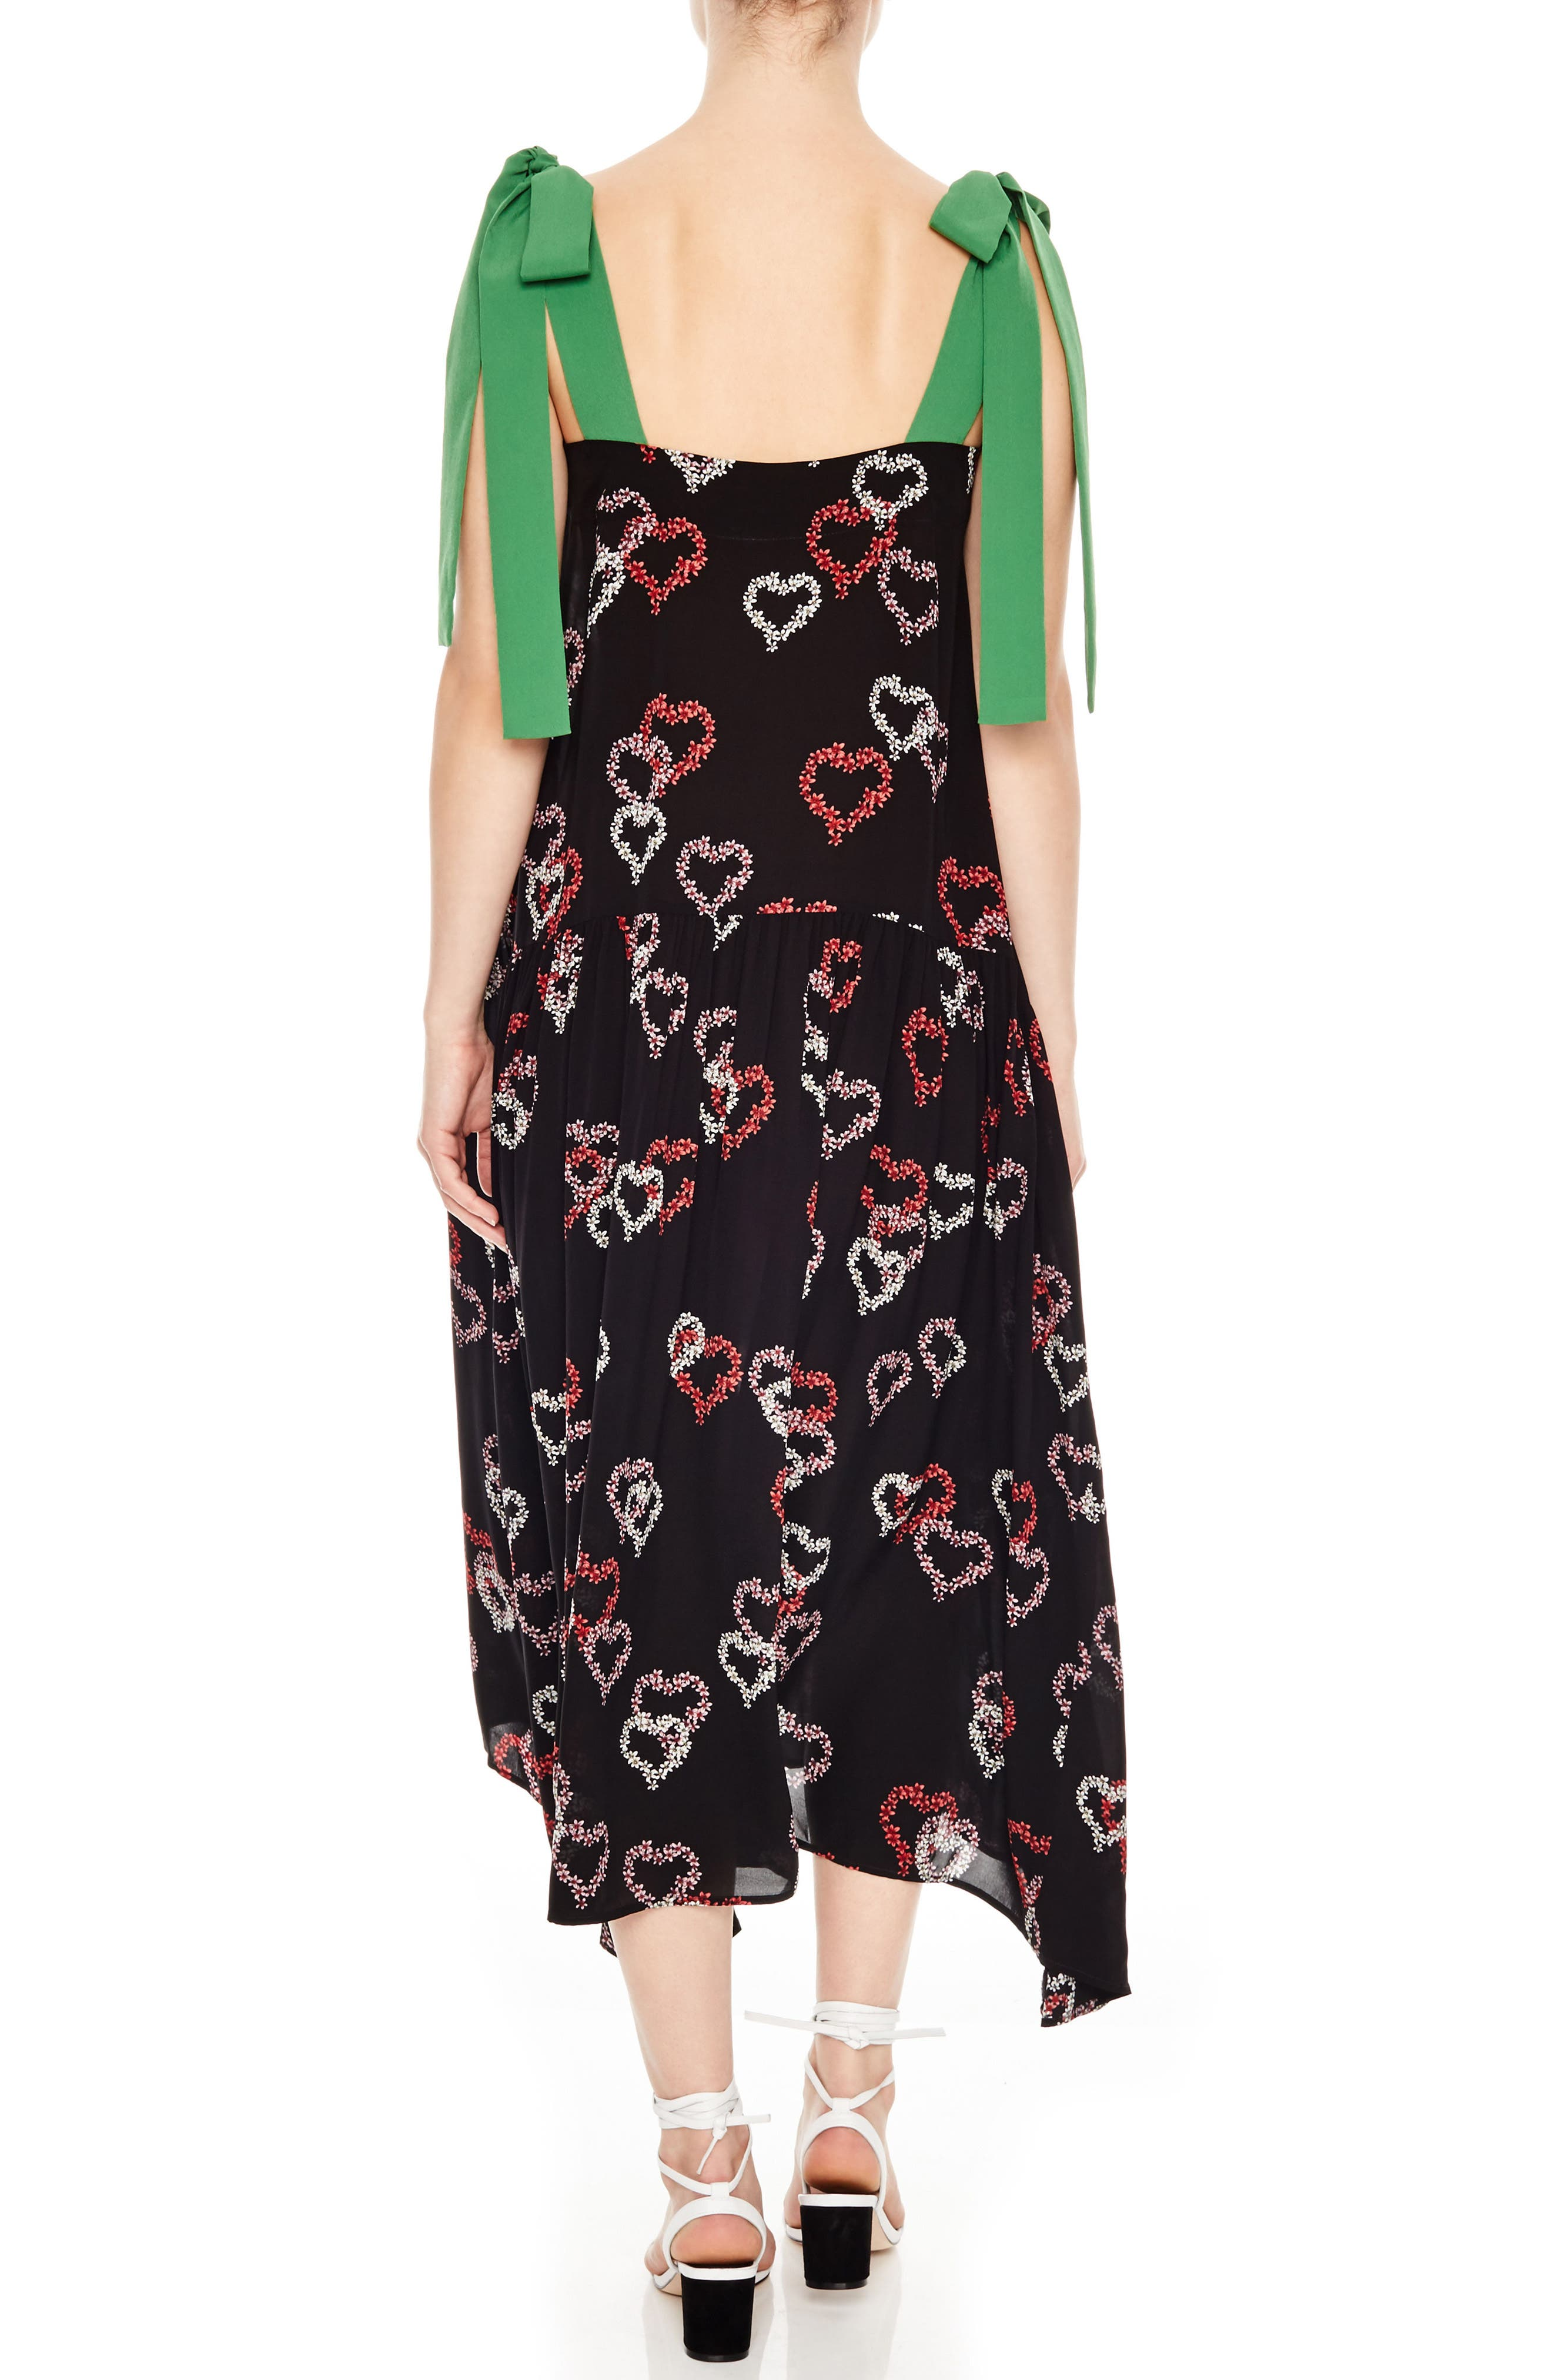 Floral Hearts Tie Strap Midi Dress,                             Alternate thumbnail 2, color,                             001